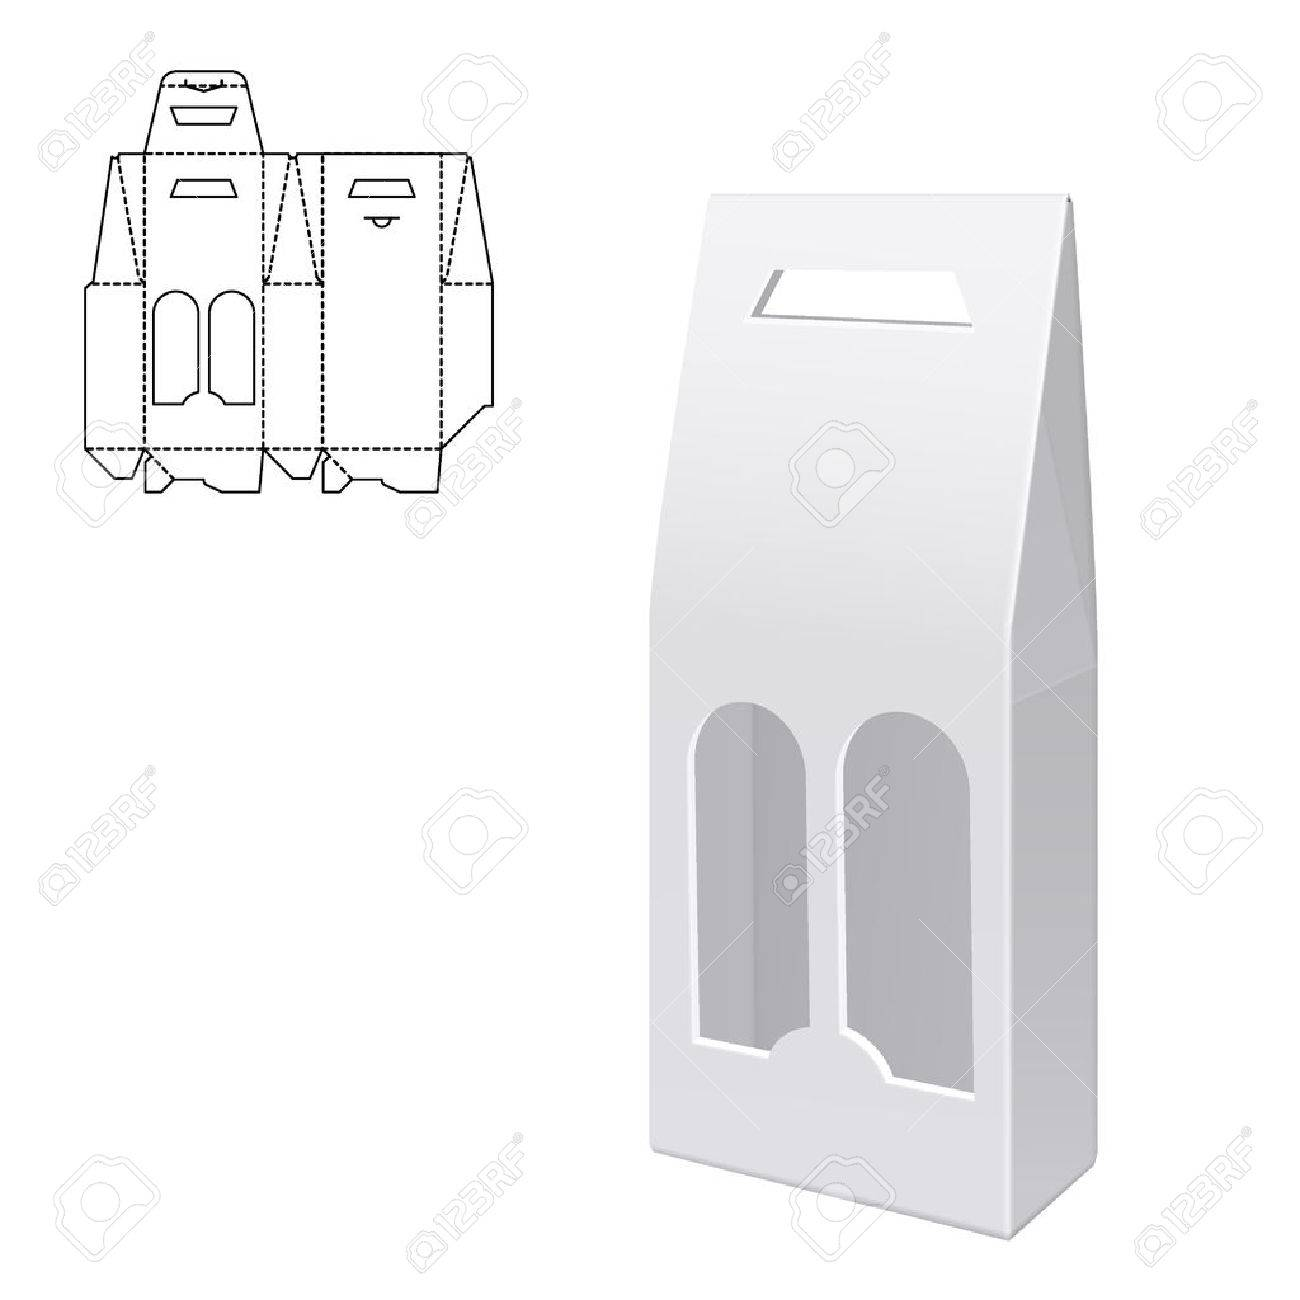 Vector Illustration Of Gift Die Cut Craft Box For Design Website